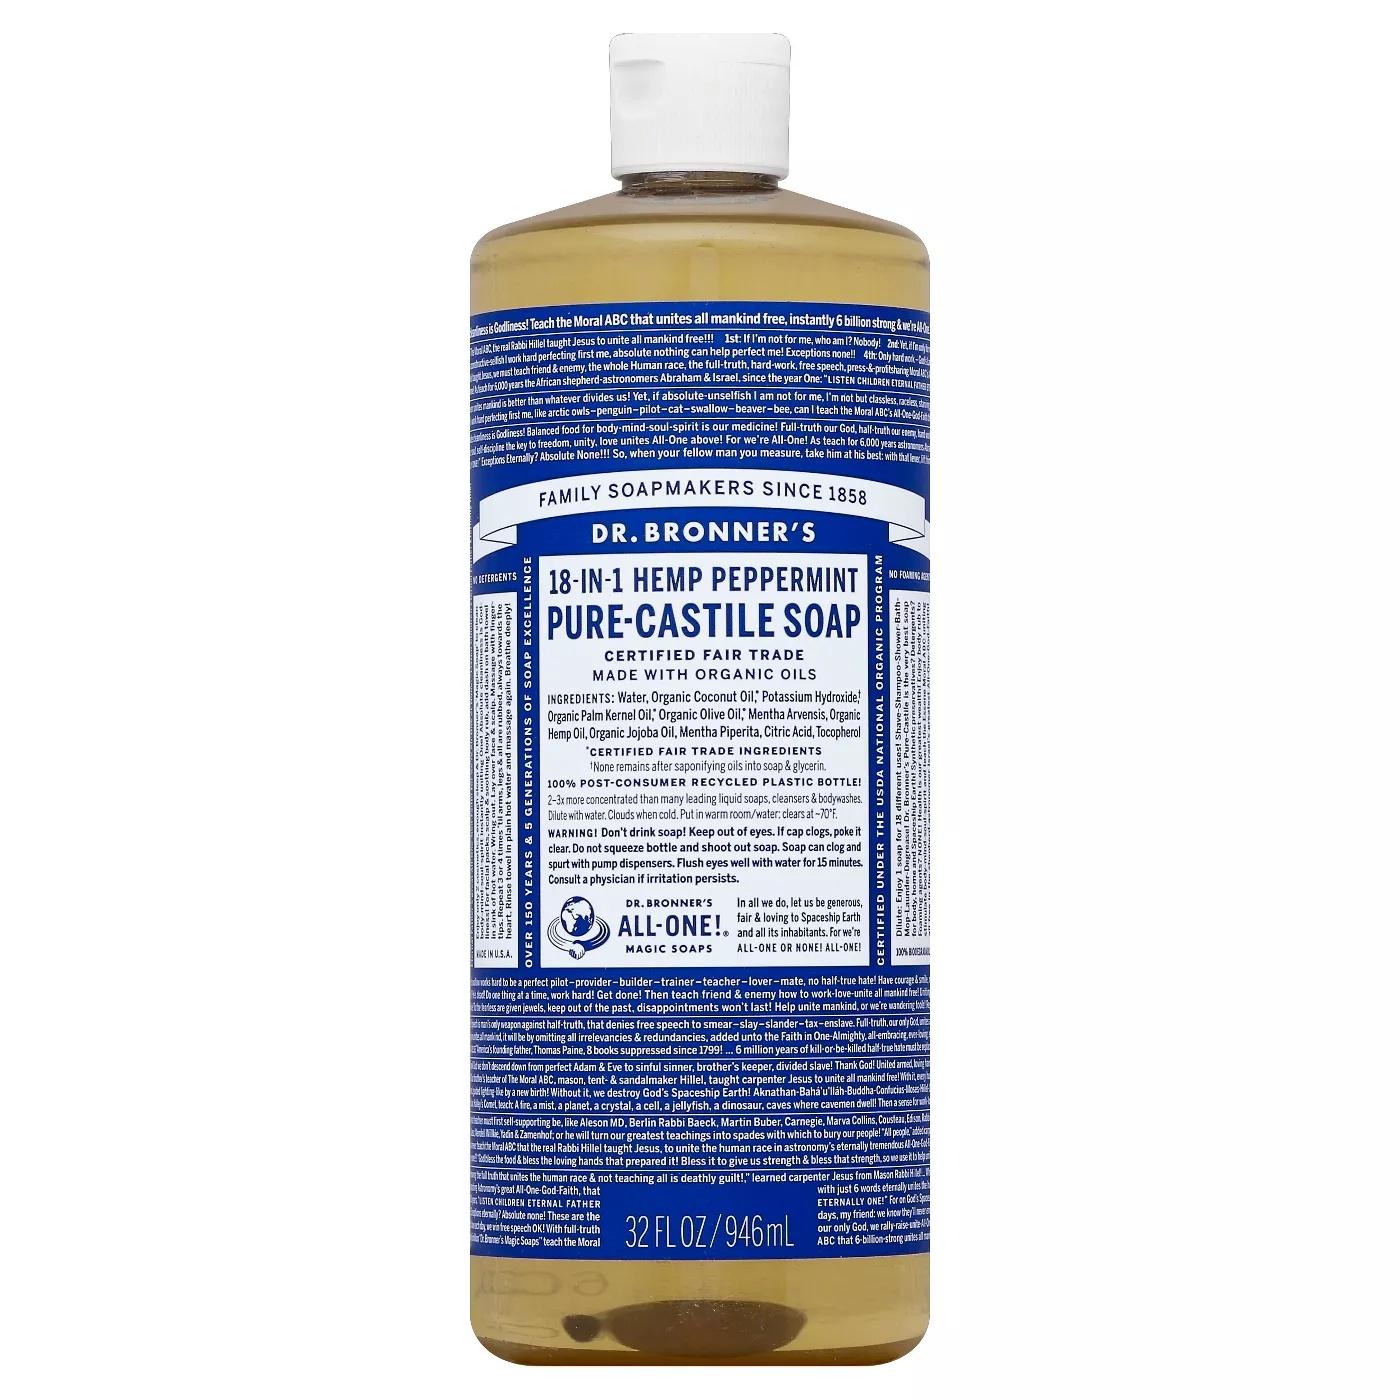 Dr. Bronner's Hemp Peppermint Pure Castile Soap